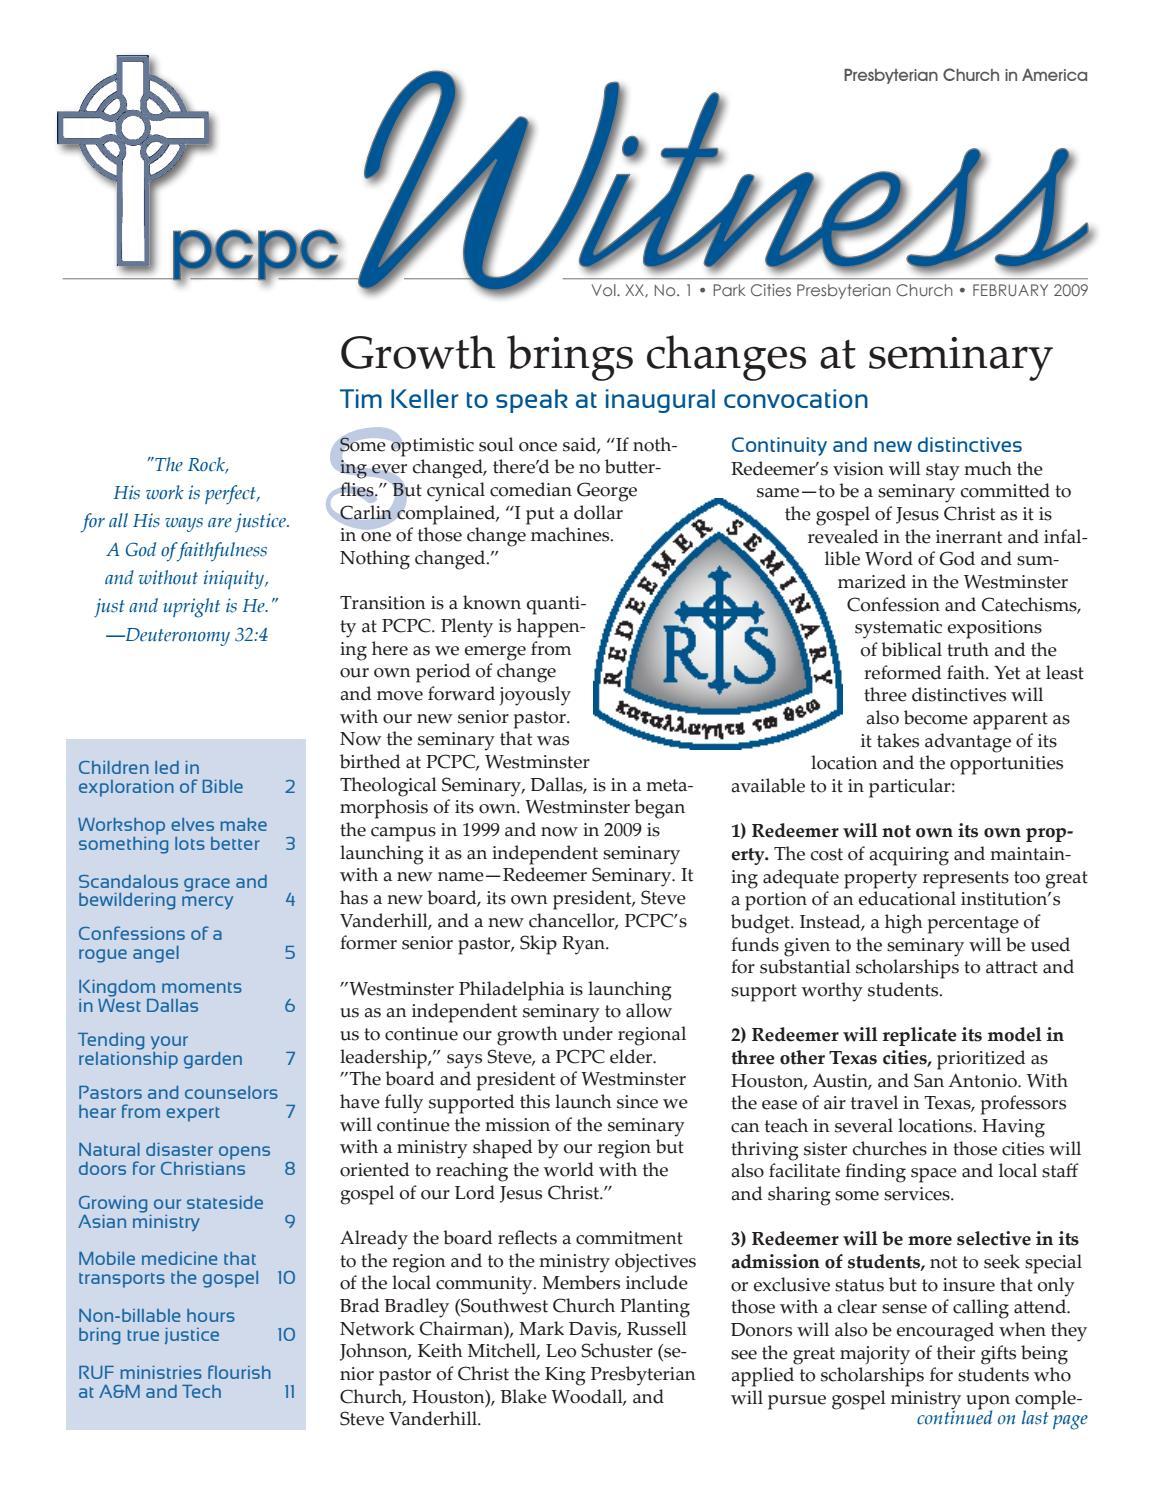 WITNESS: February 1, 2009 by Park Cities Presbyterian Church